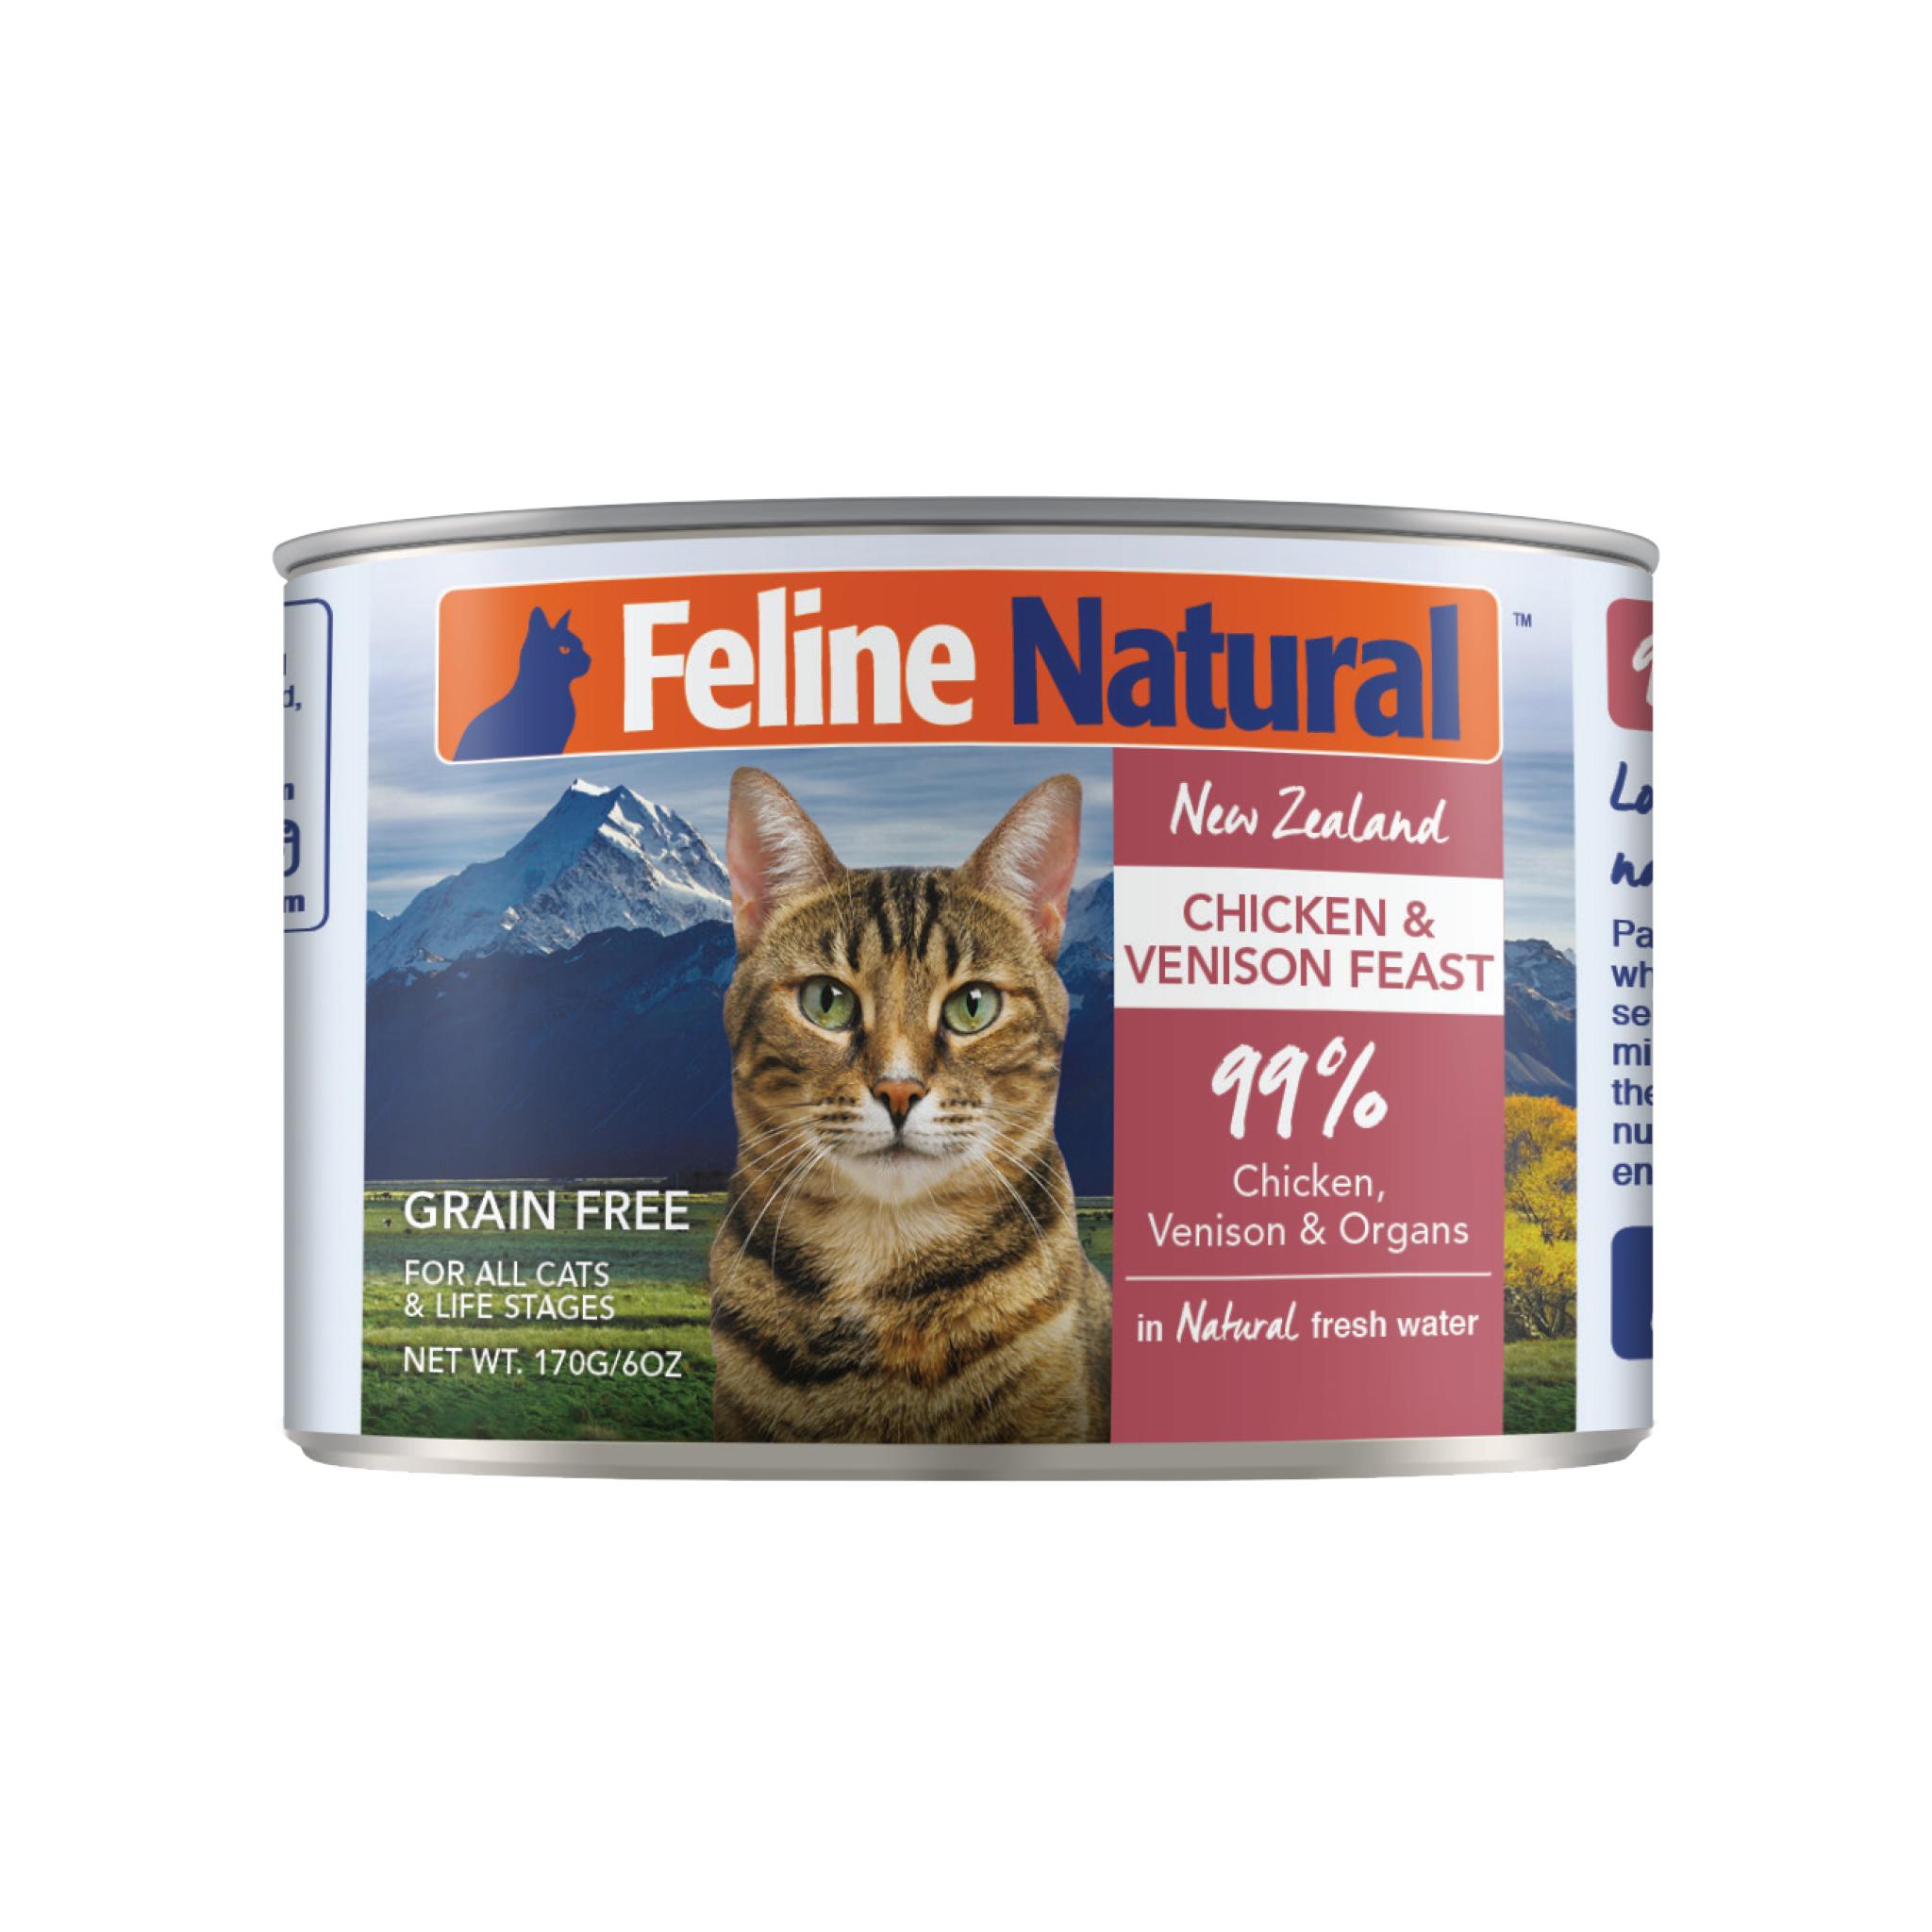 Feline Natural Feline Natural Chicken & Venison Feast Wet Cat Food 3oz